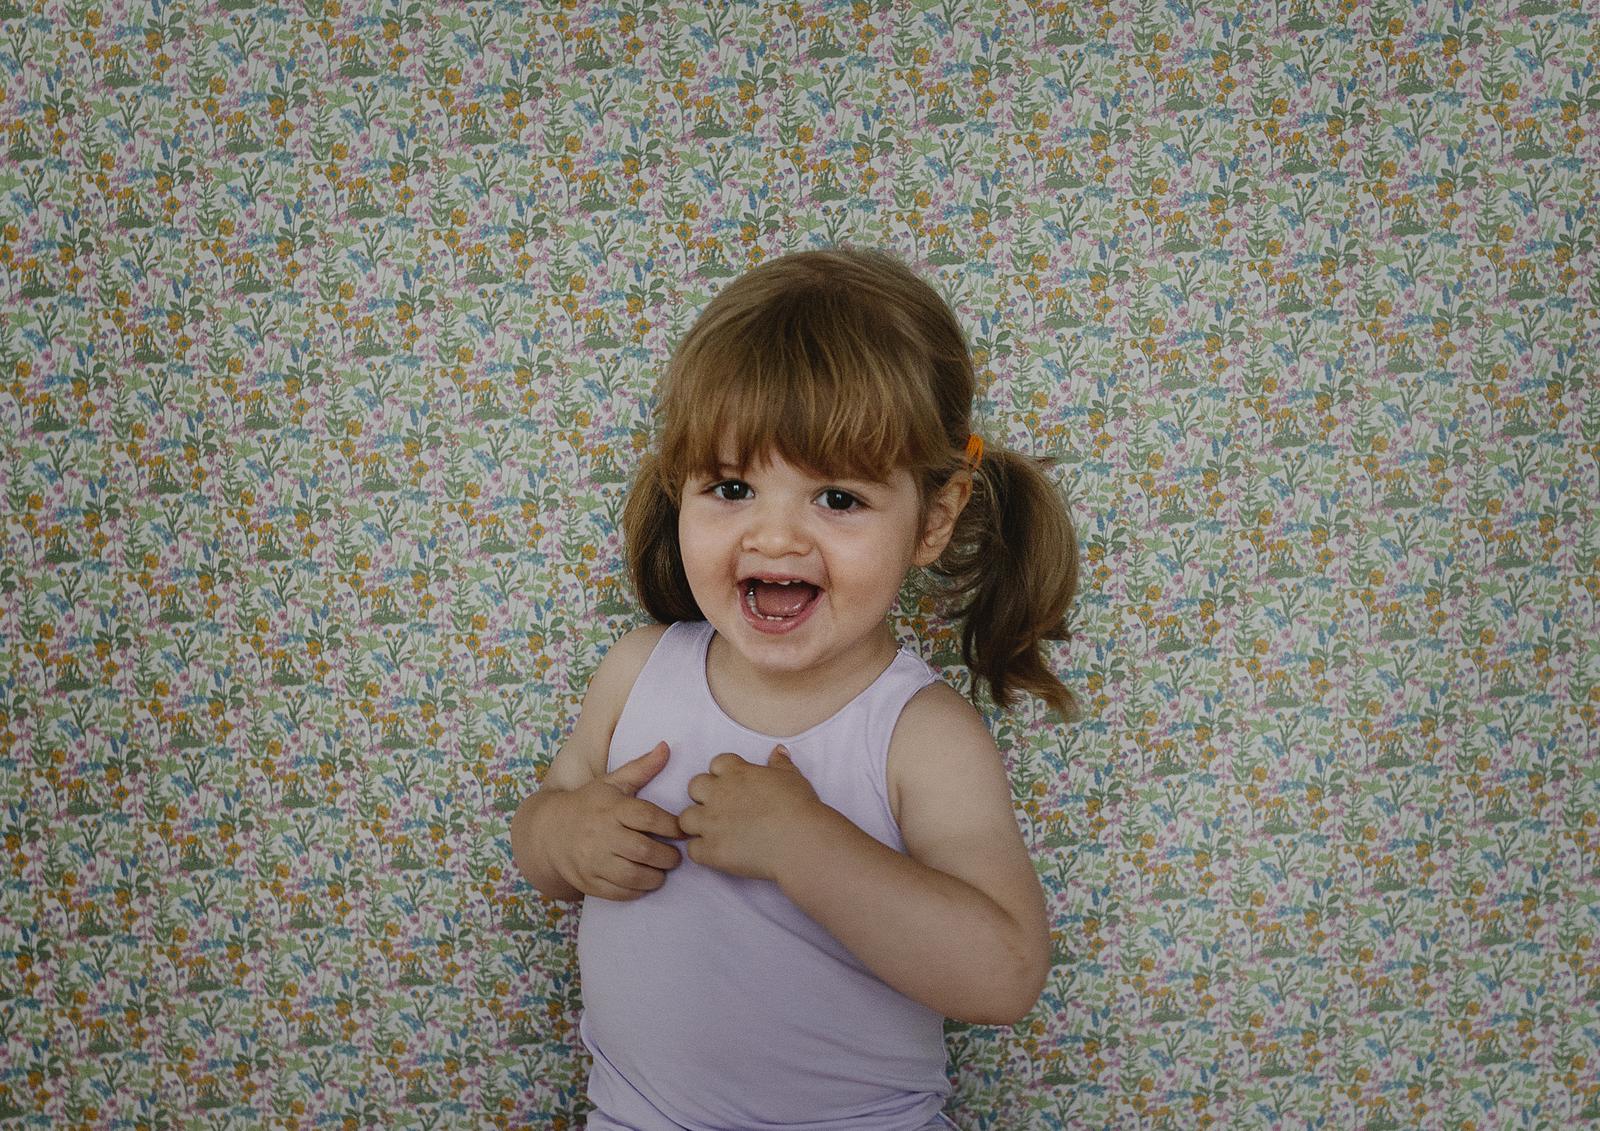 Natural Toddler Photographer Melbourne